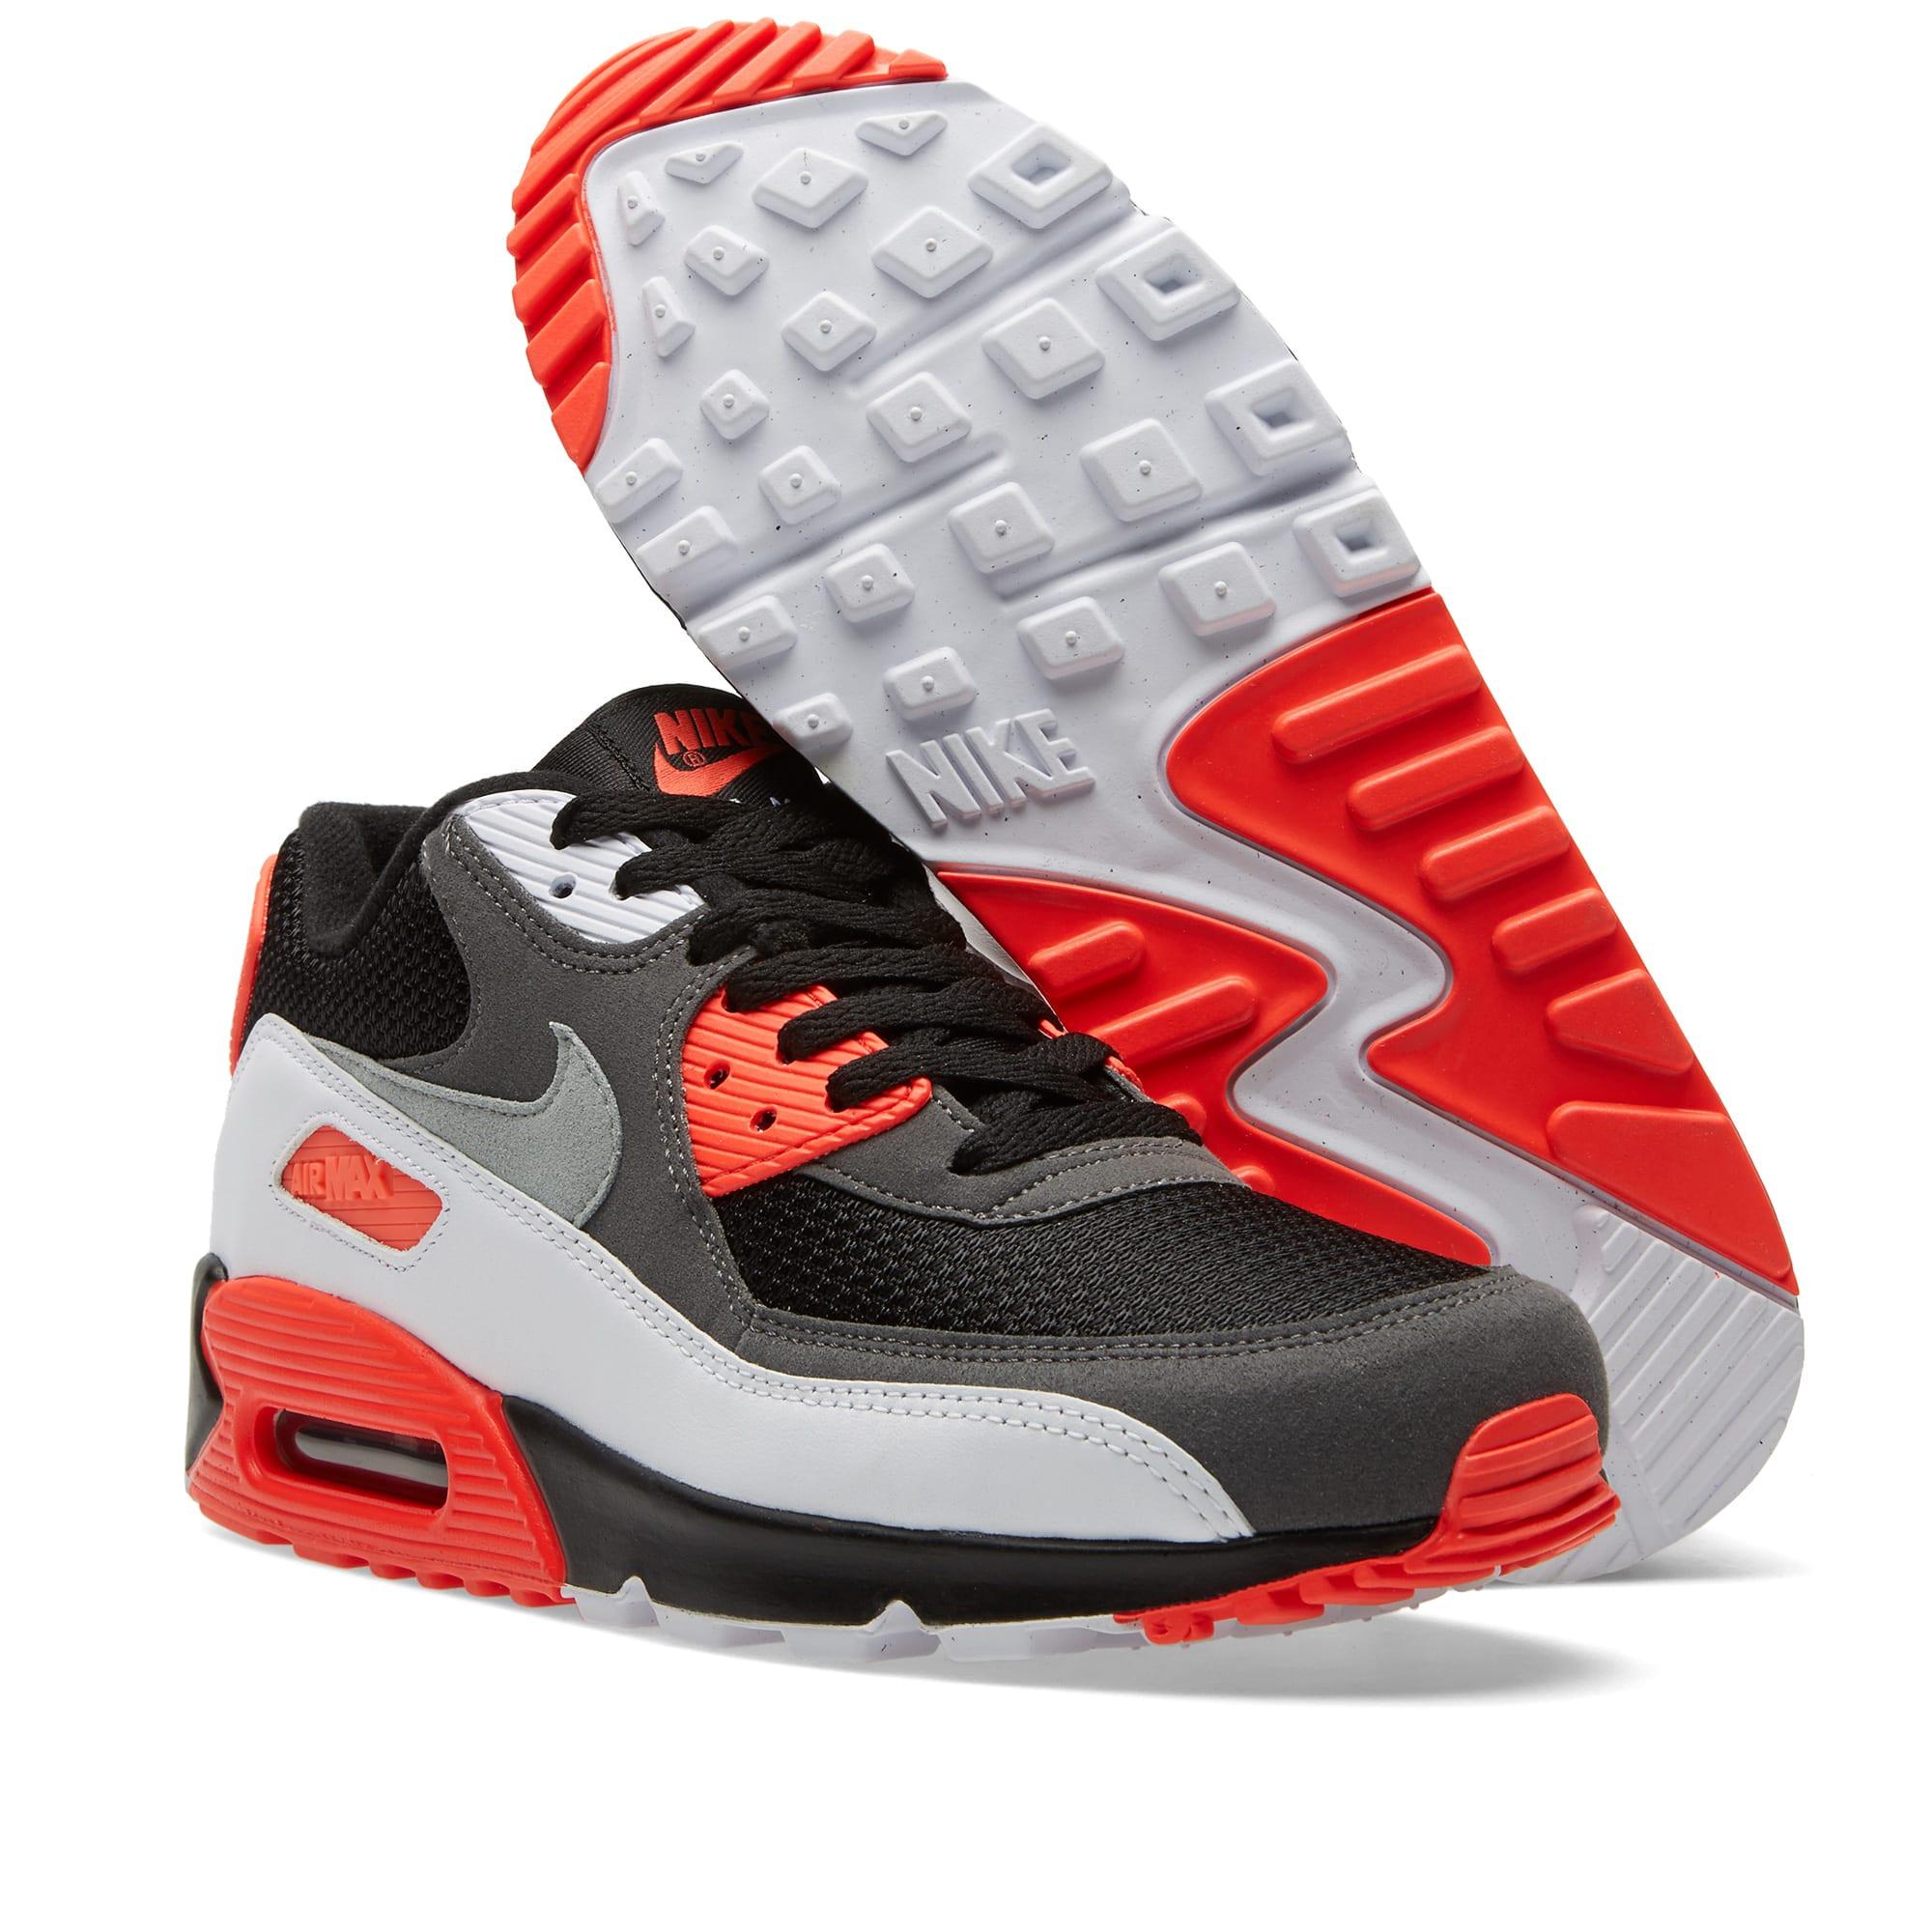 champú Península Expulsar a  Nike Air Max 90 OG 'Reverse Infrared' Black, Neutral & Dark Grey | END.